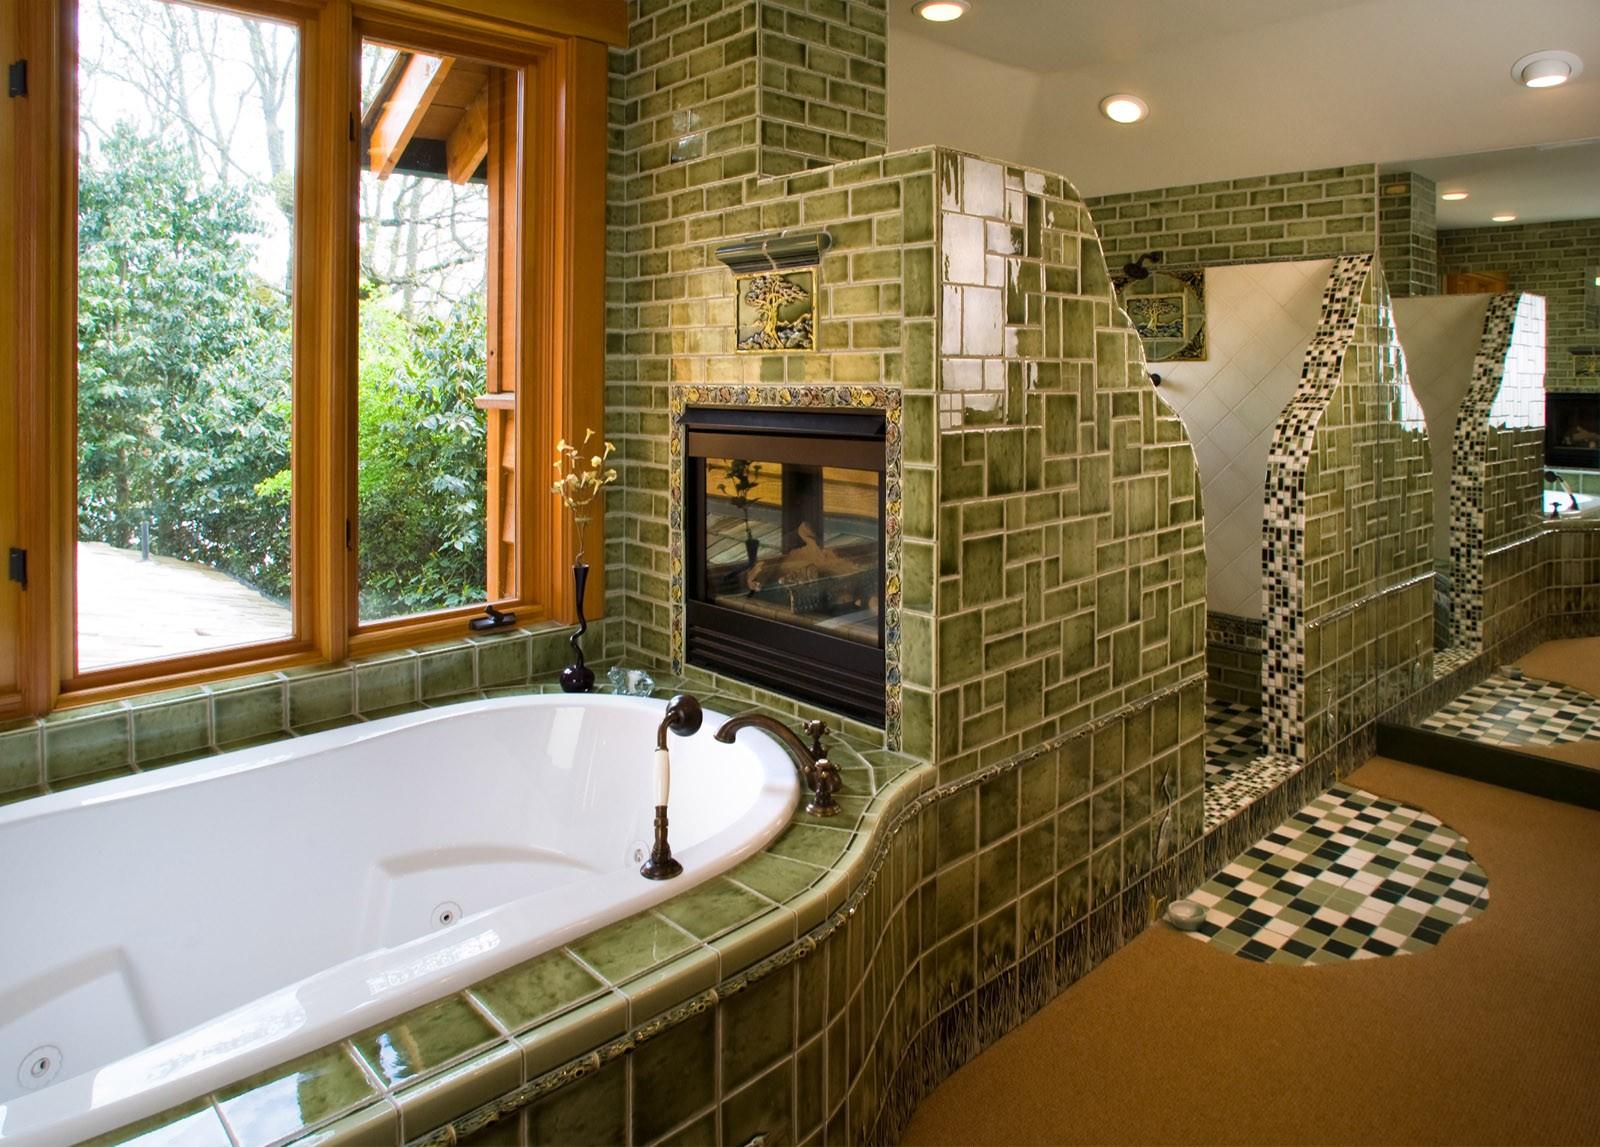 6 Reasons We Love Patterned Tile HuffPost